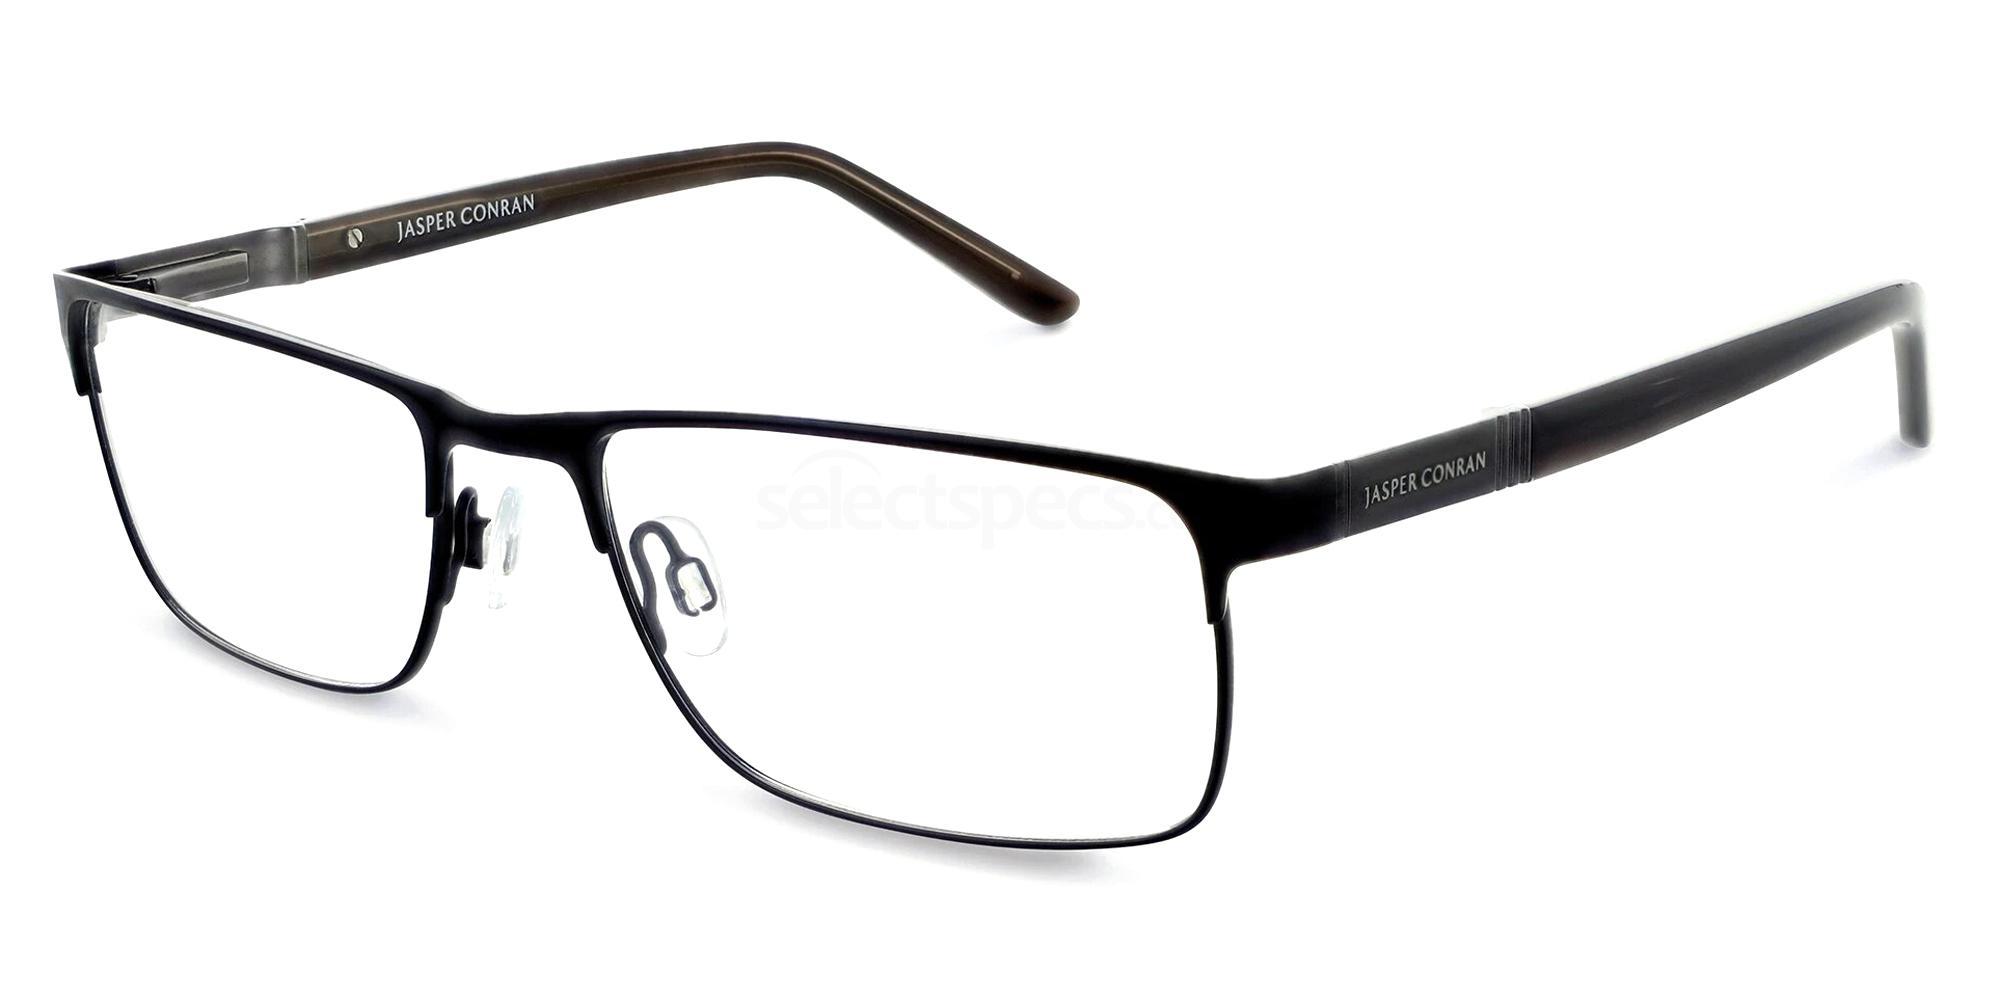 Col 1 JCM009 Glasses, Jasper Conran